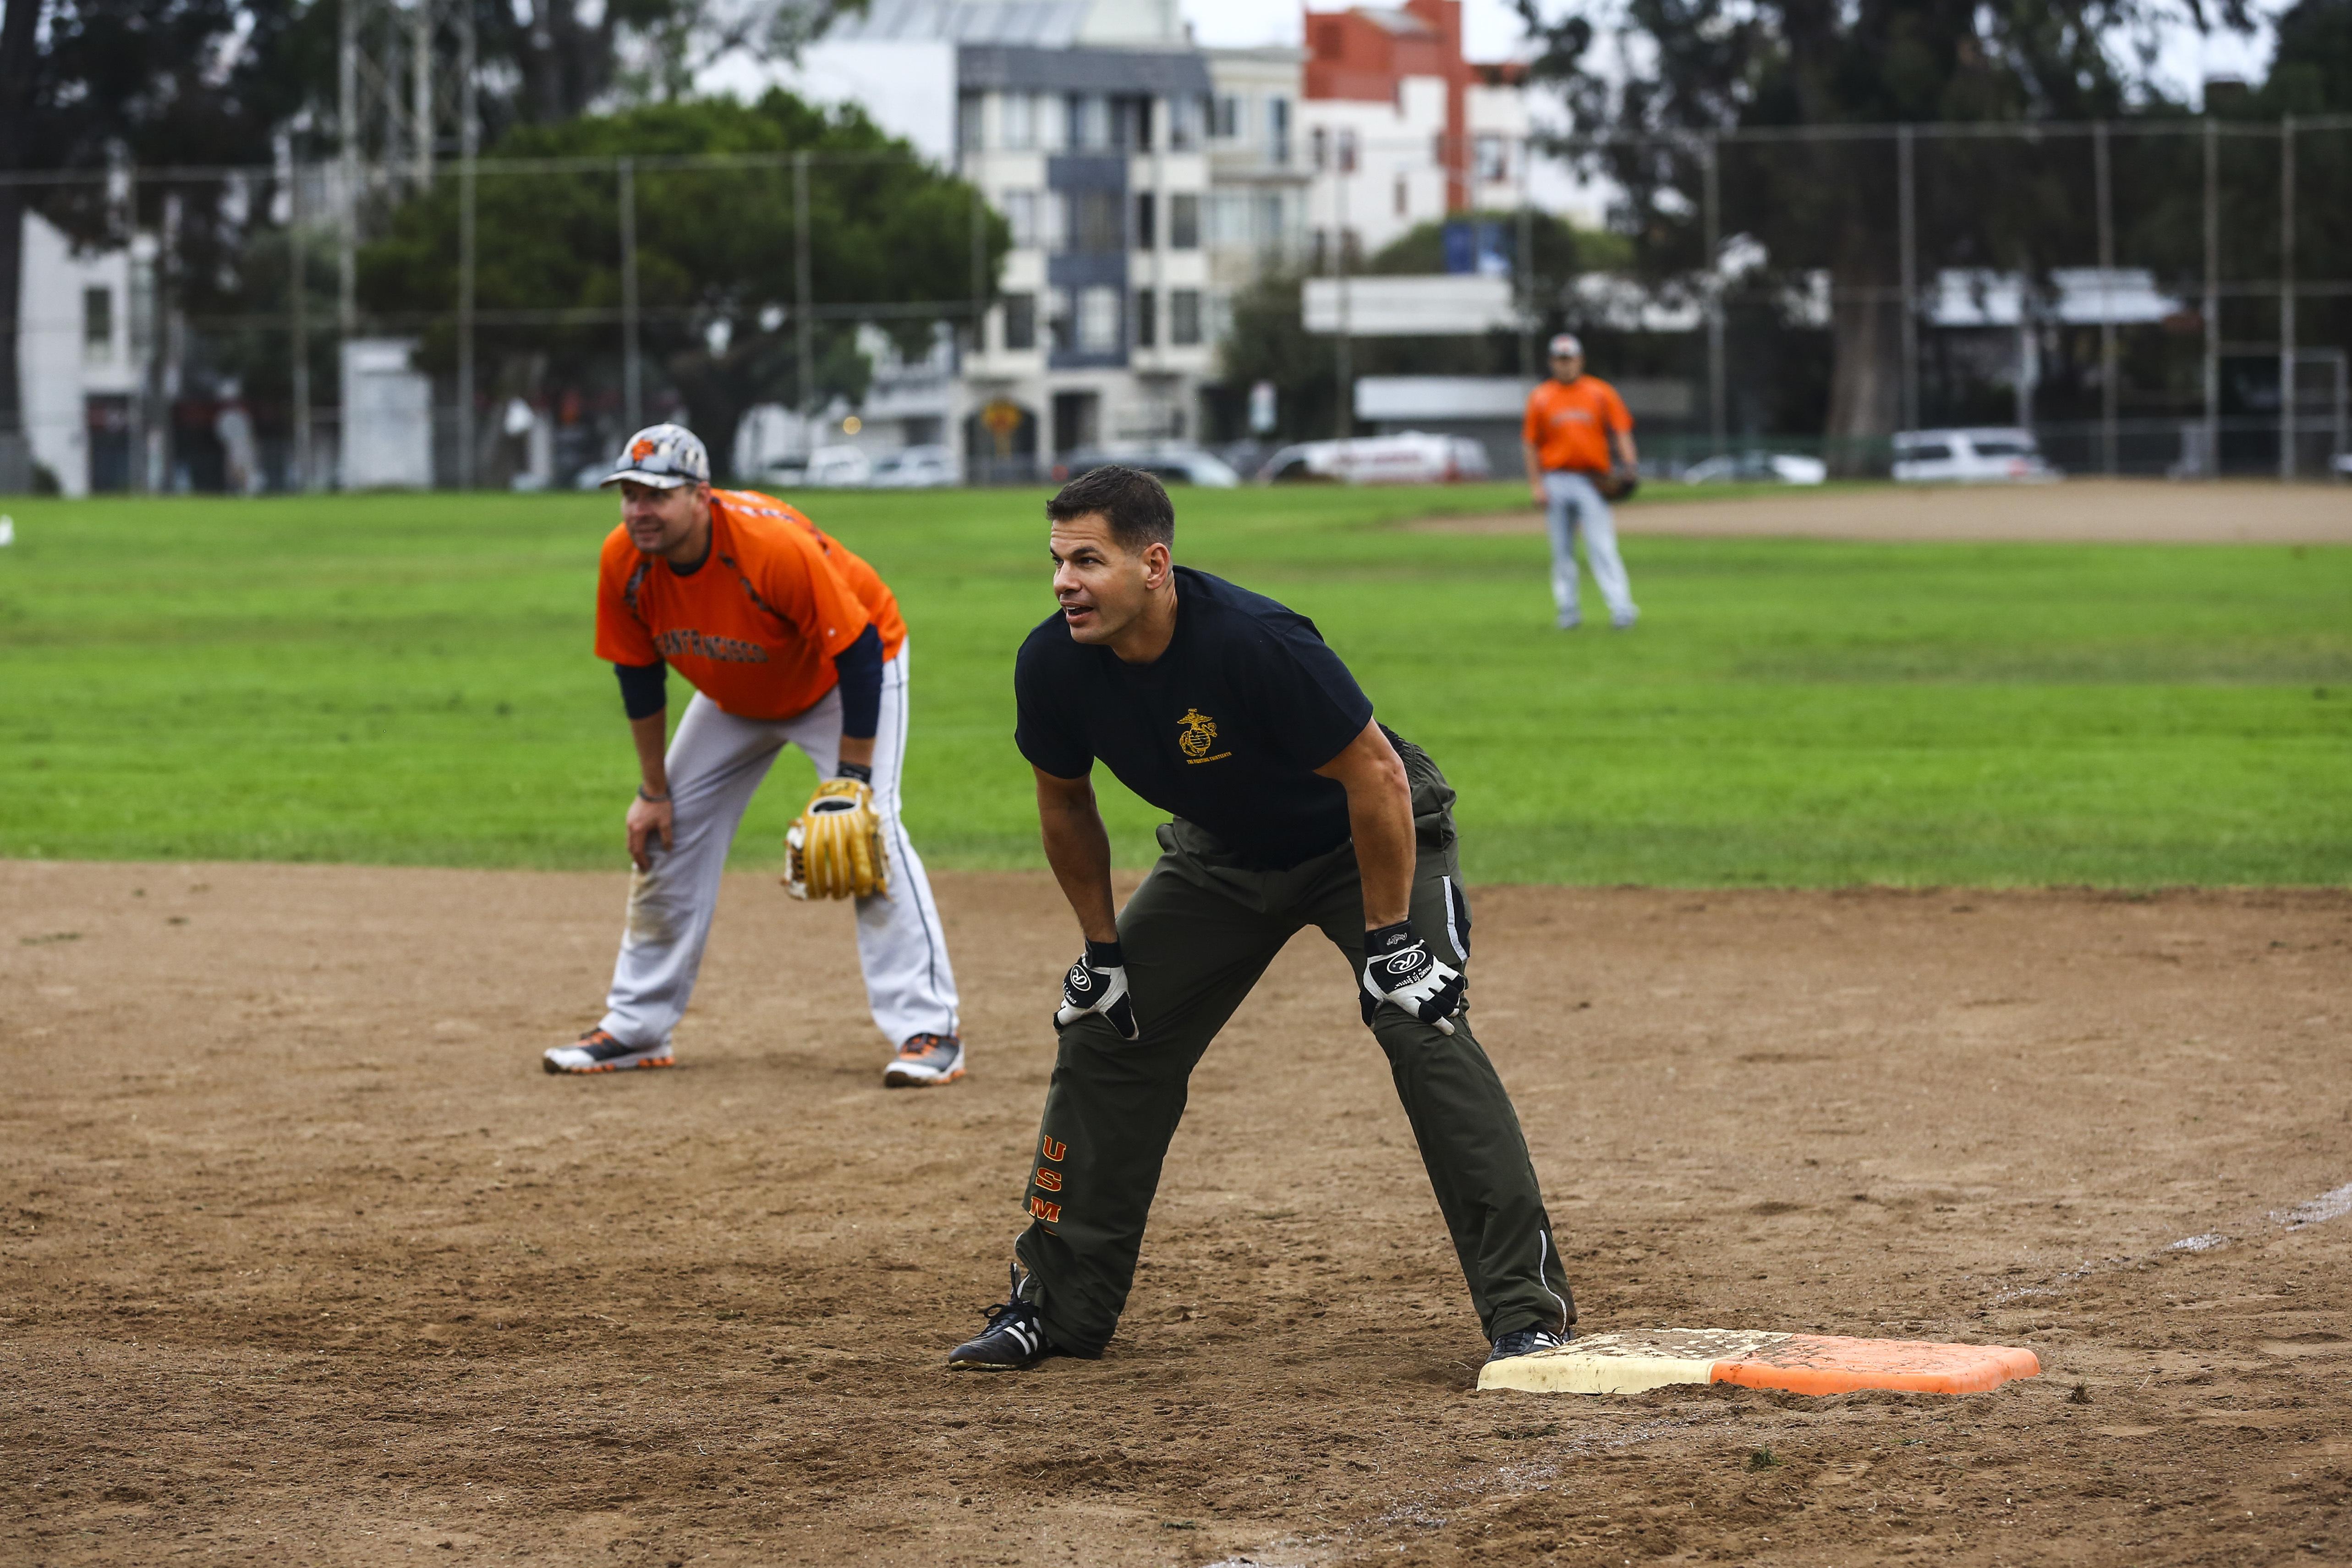 Marines play softball